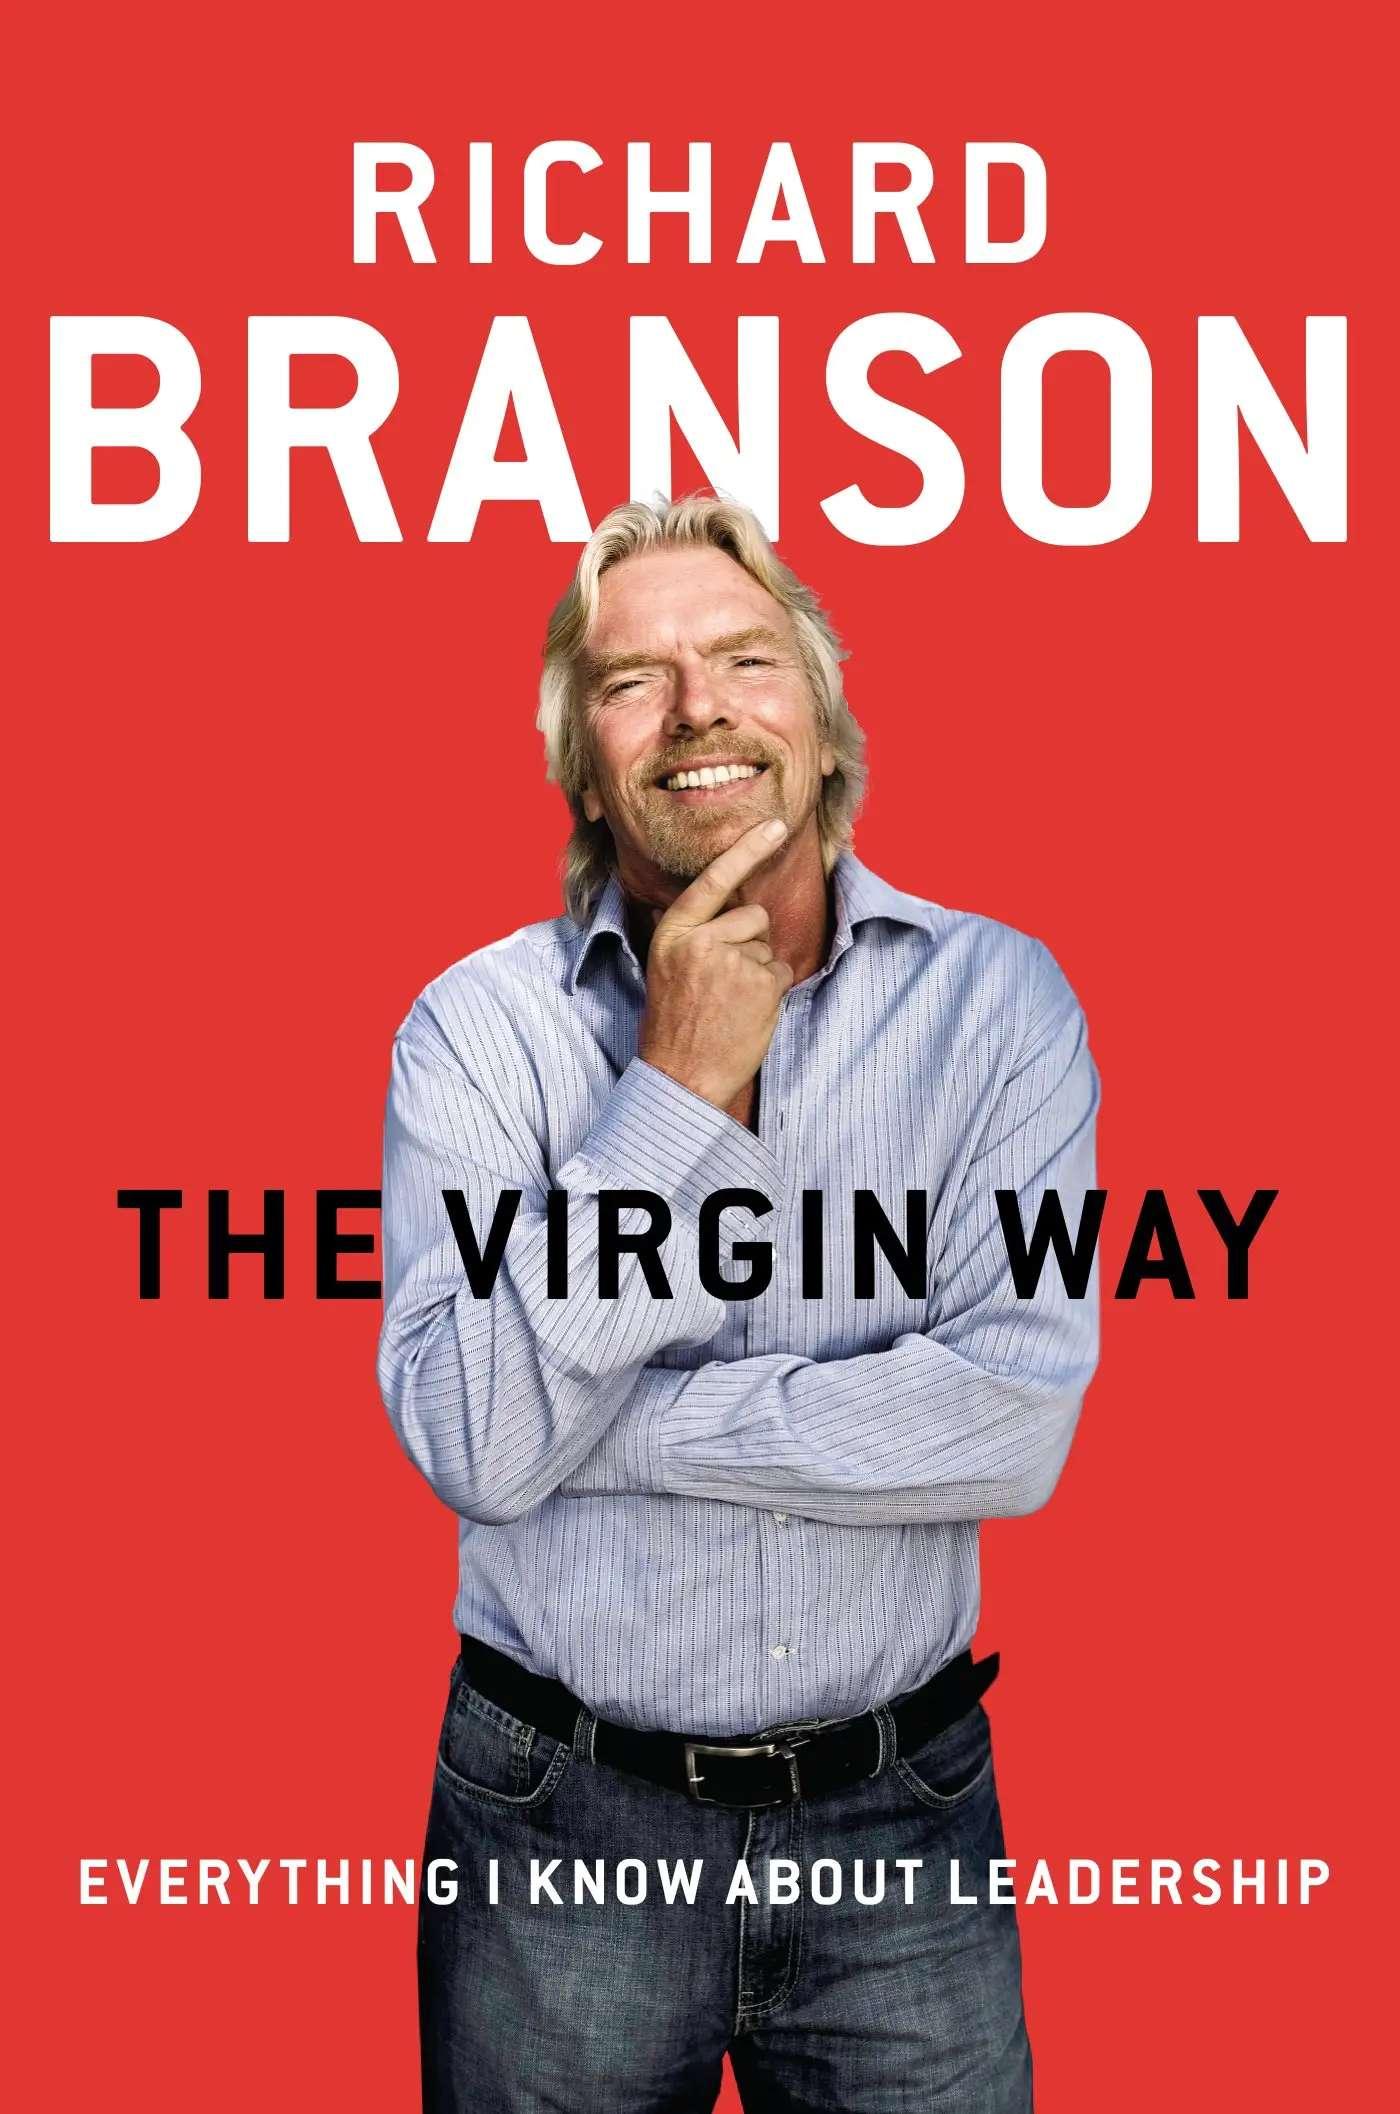 'The Virgin Way' by Richard Branson